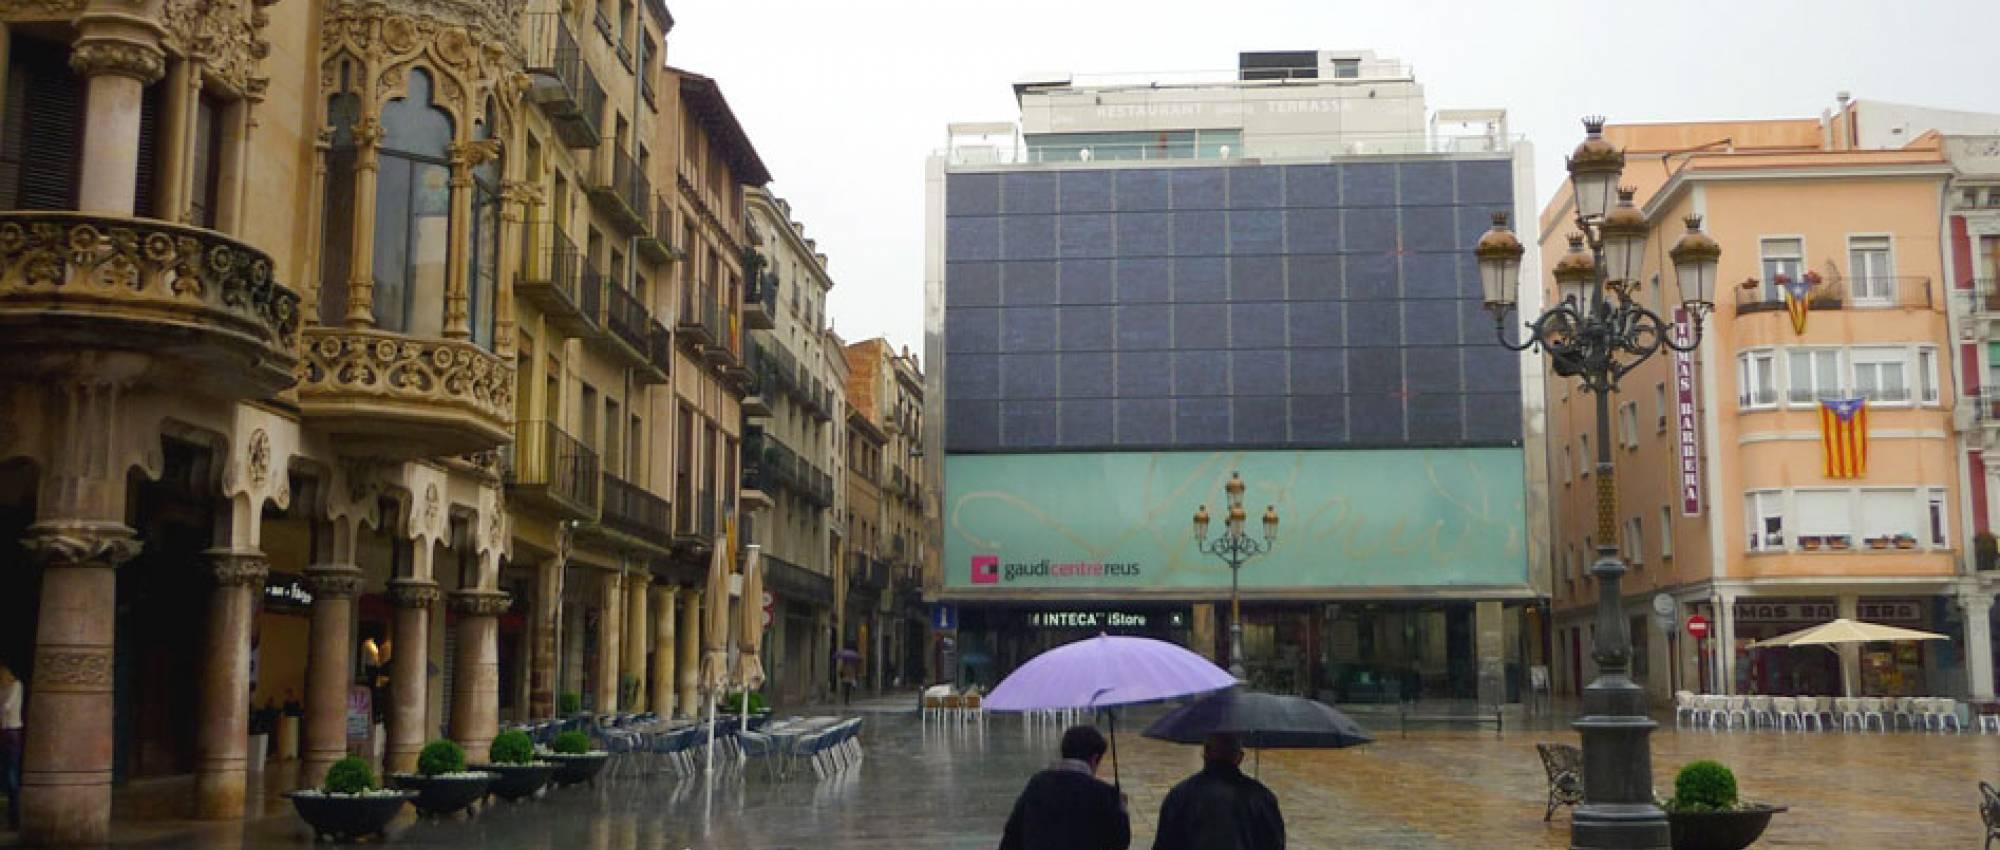 Vista exterior del edifici Gaudí Centre de Reus. calafellvalo / Flickr. CC BY-NC-ND 2.0